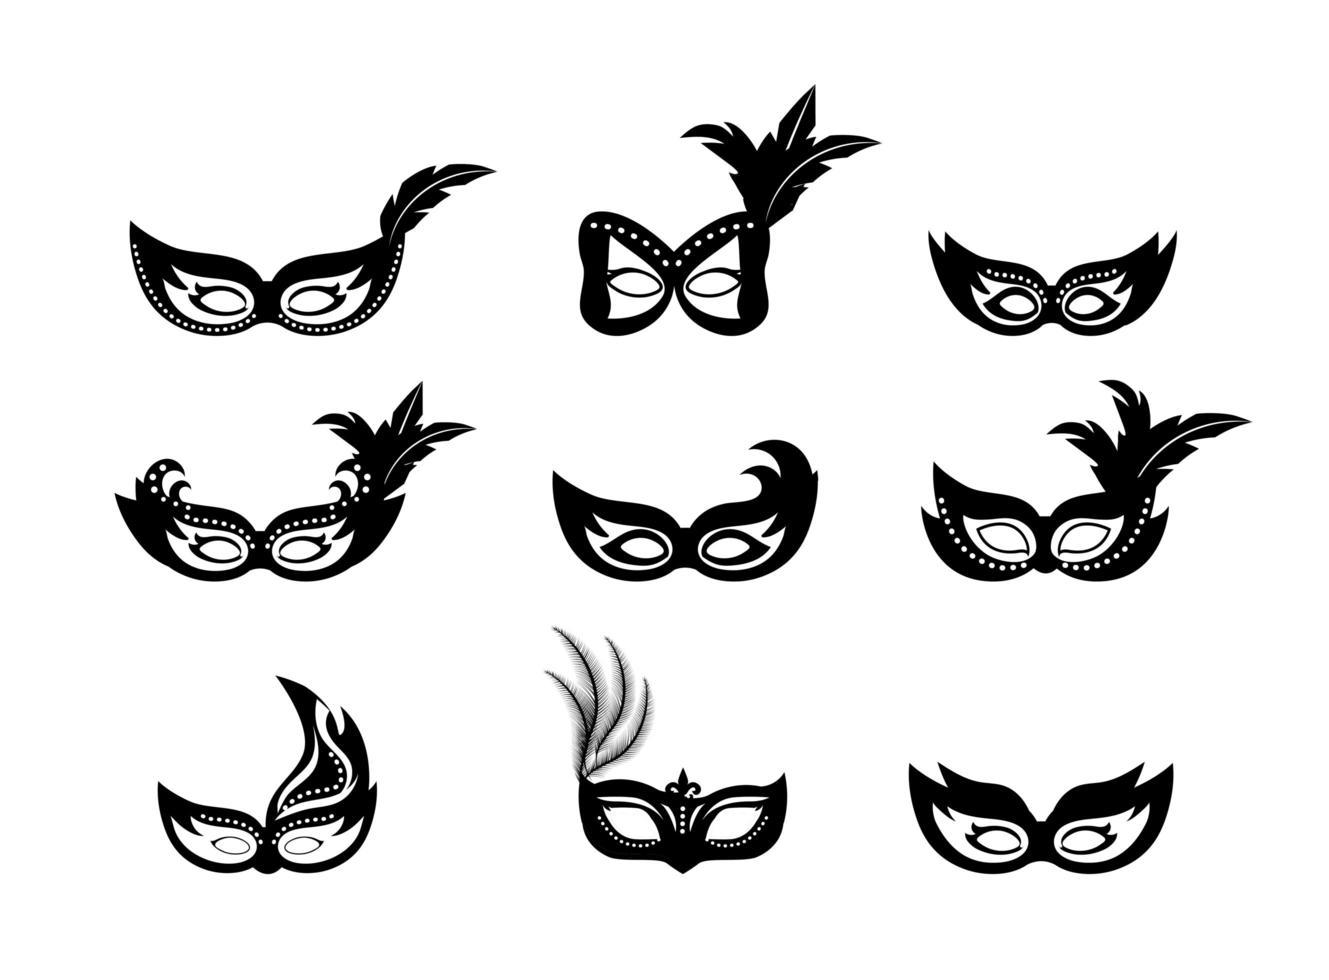 Mardi gras masks silhouette icon set vector